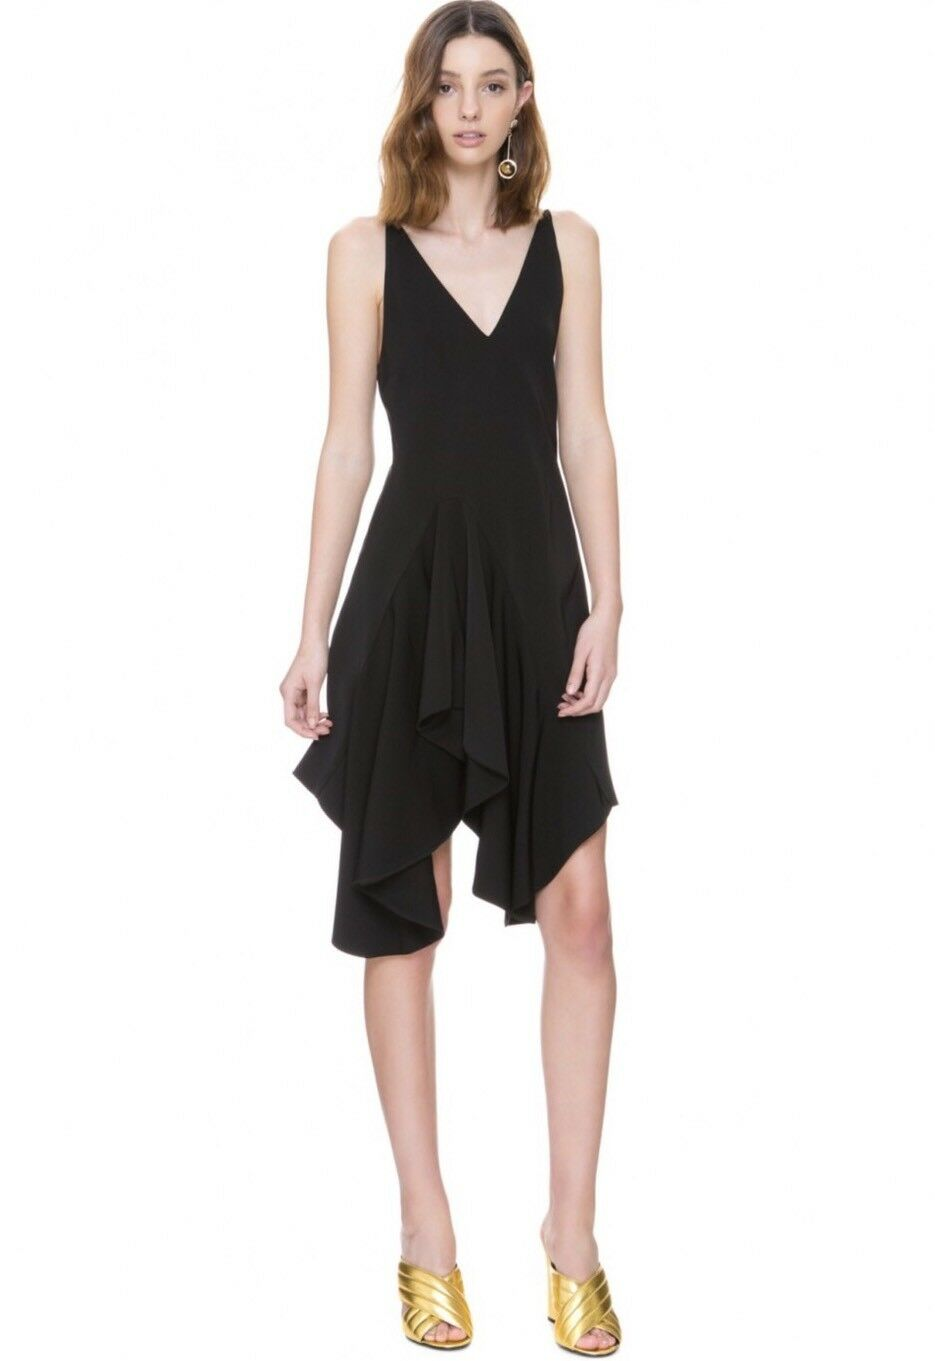 NWT C Meo Collective Spelt Out Dress Größe Medium schwarz LBD